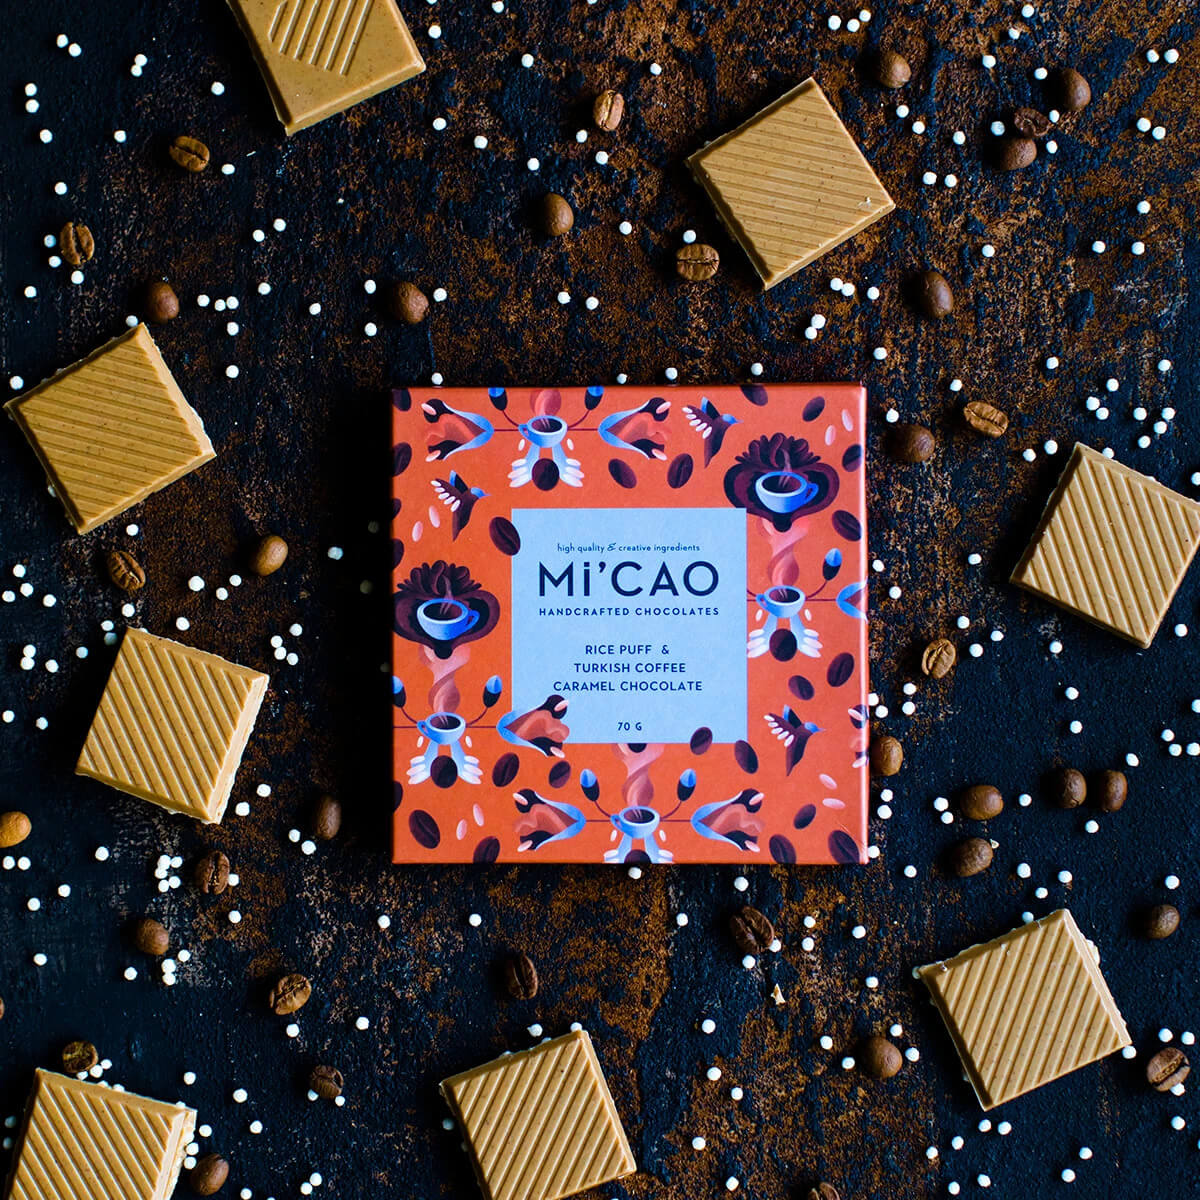 MI'Cao Pirinç Patlağı & Türk Kahveli Karamel Çikolata Tablet 70GR